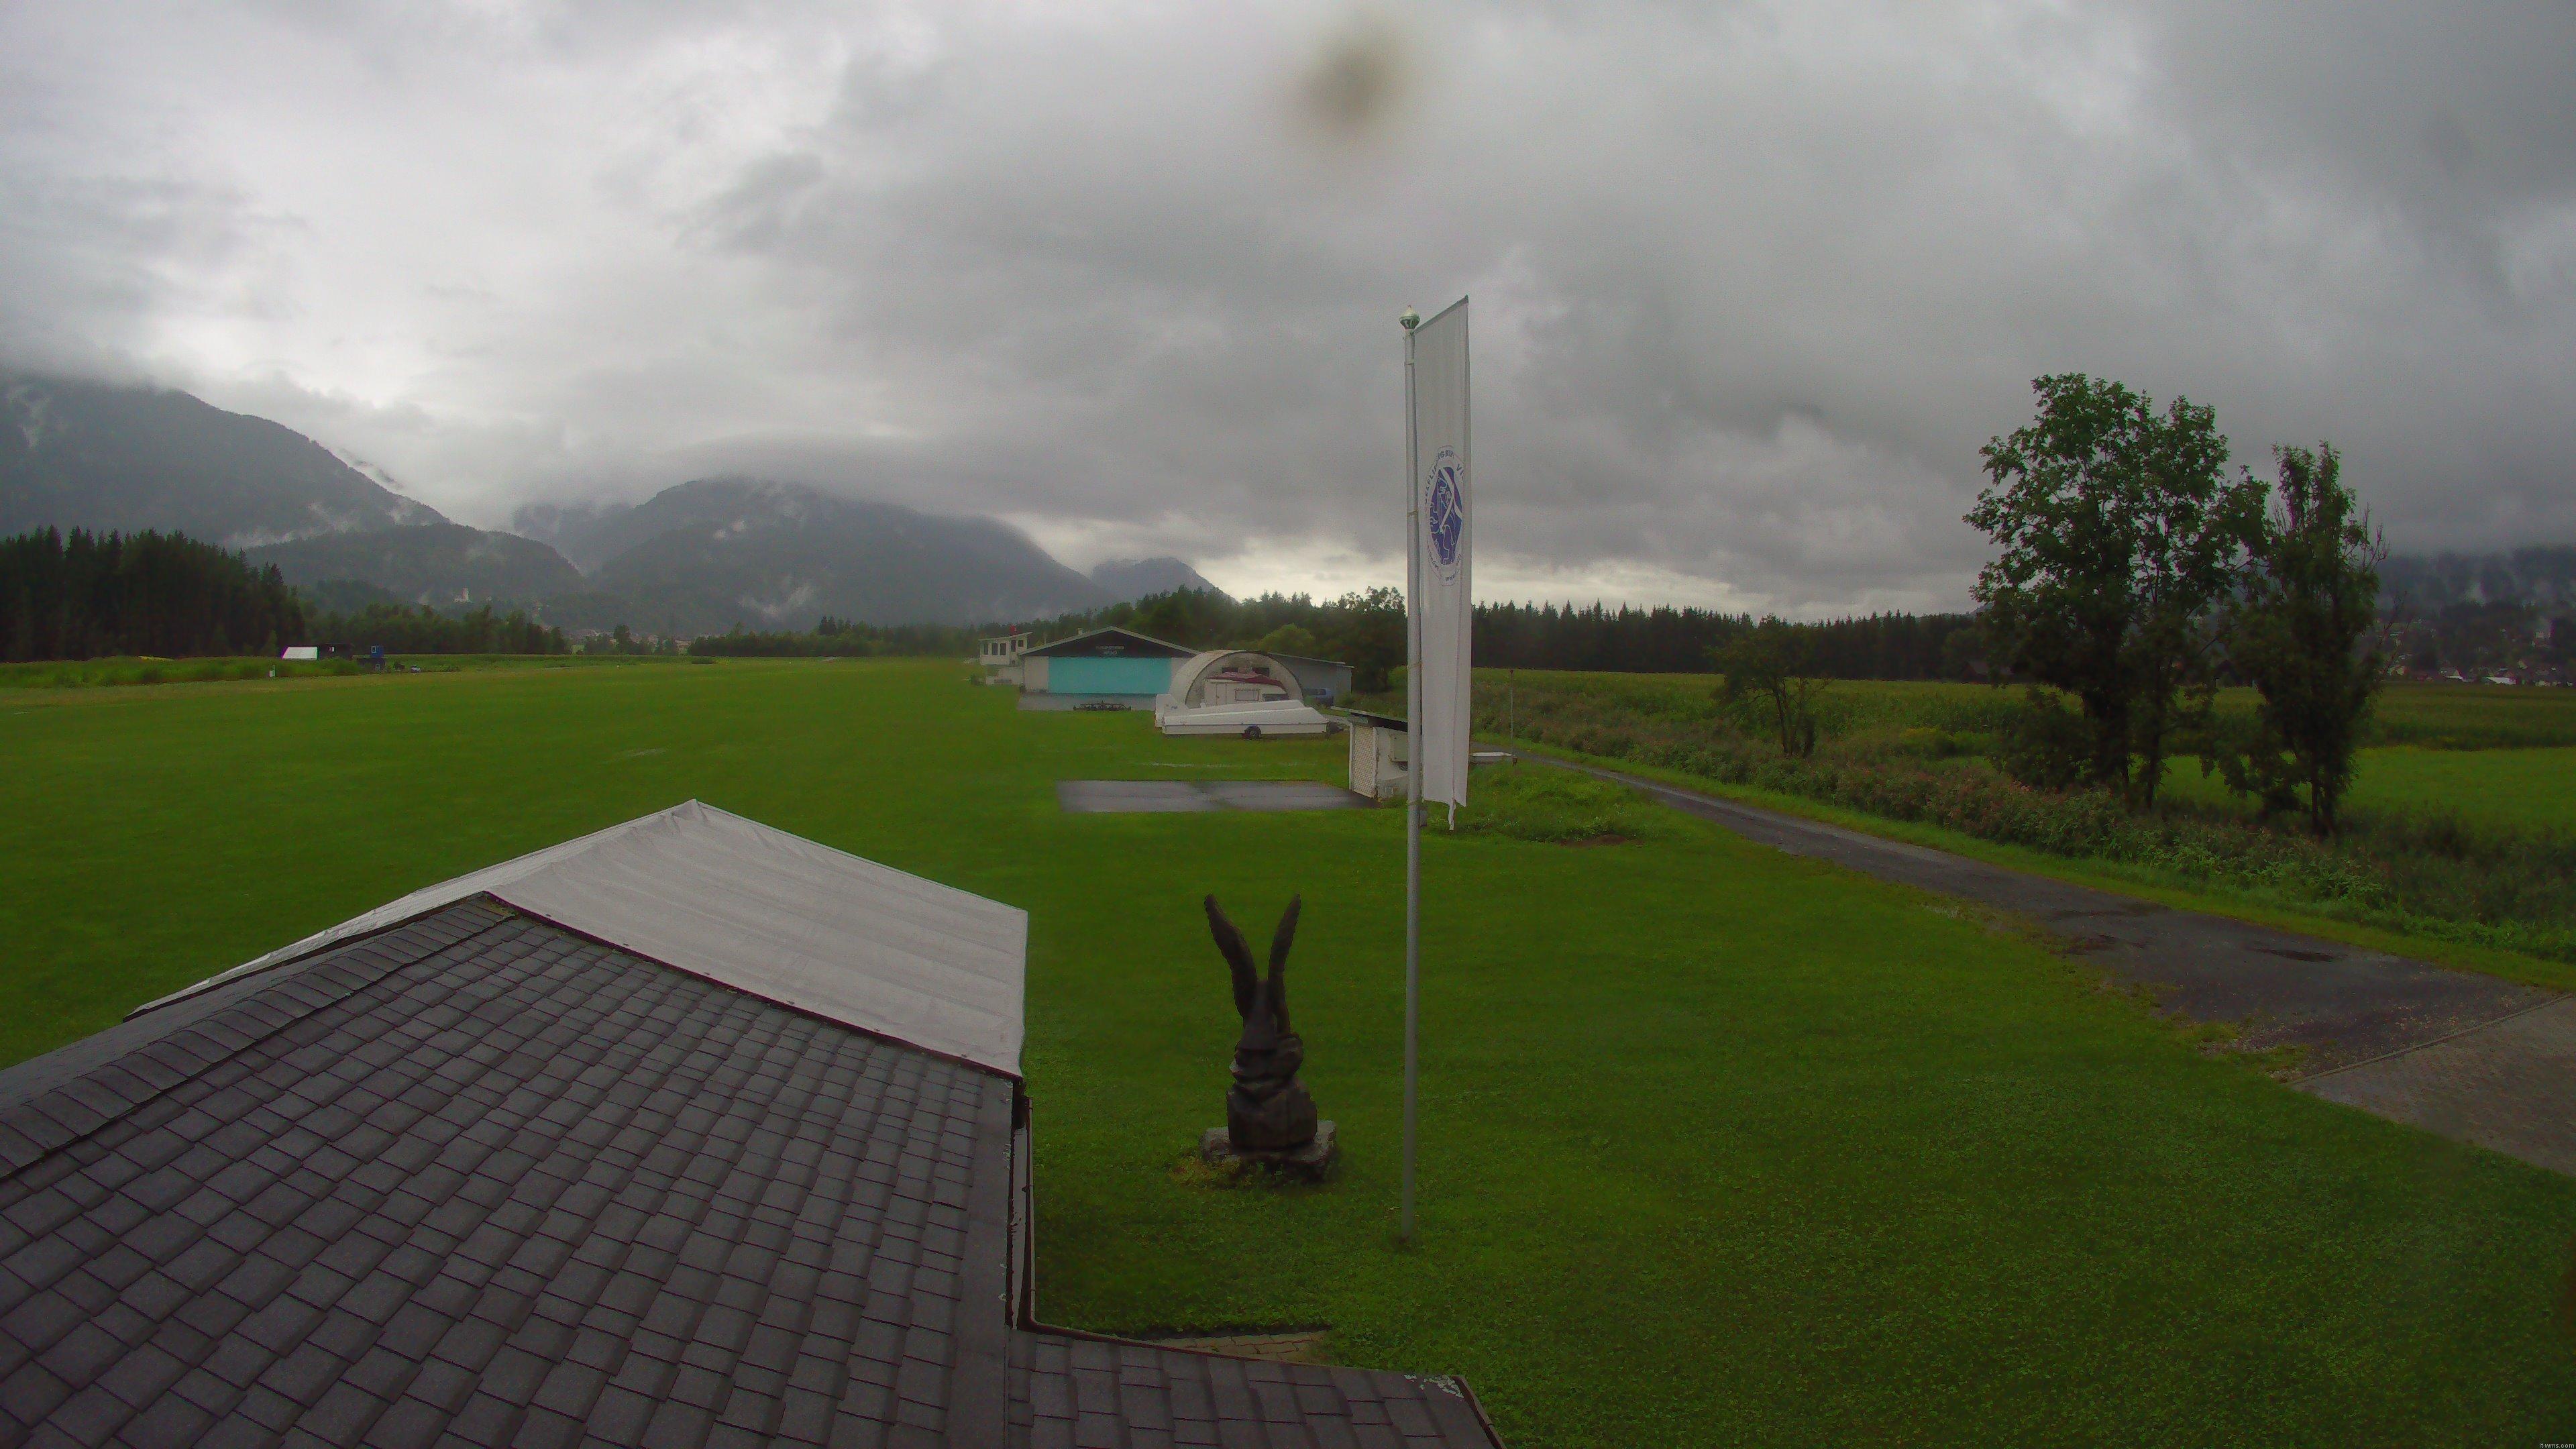 Ntsch im Gailtal: Urlaub Ntsch im Gailtal - BERGFEX